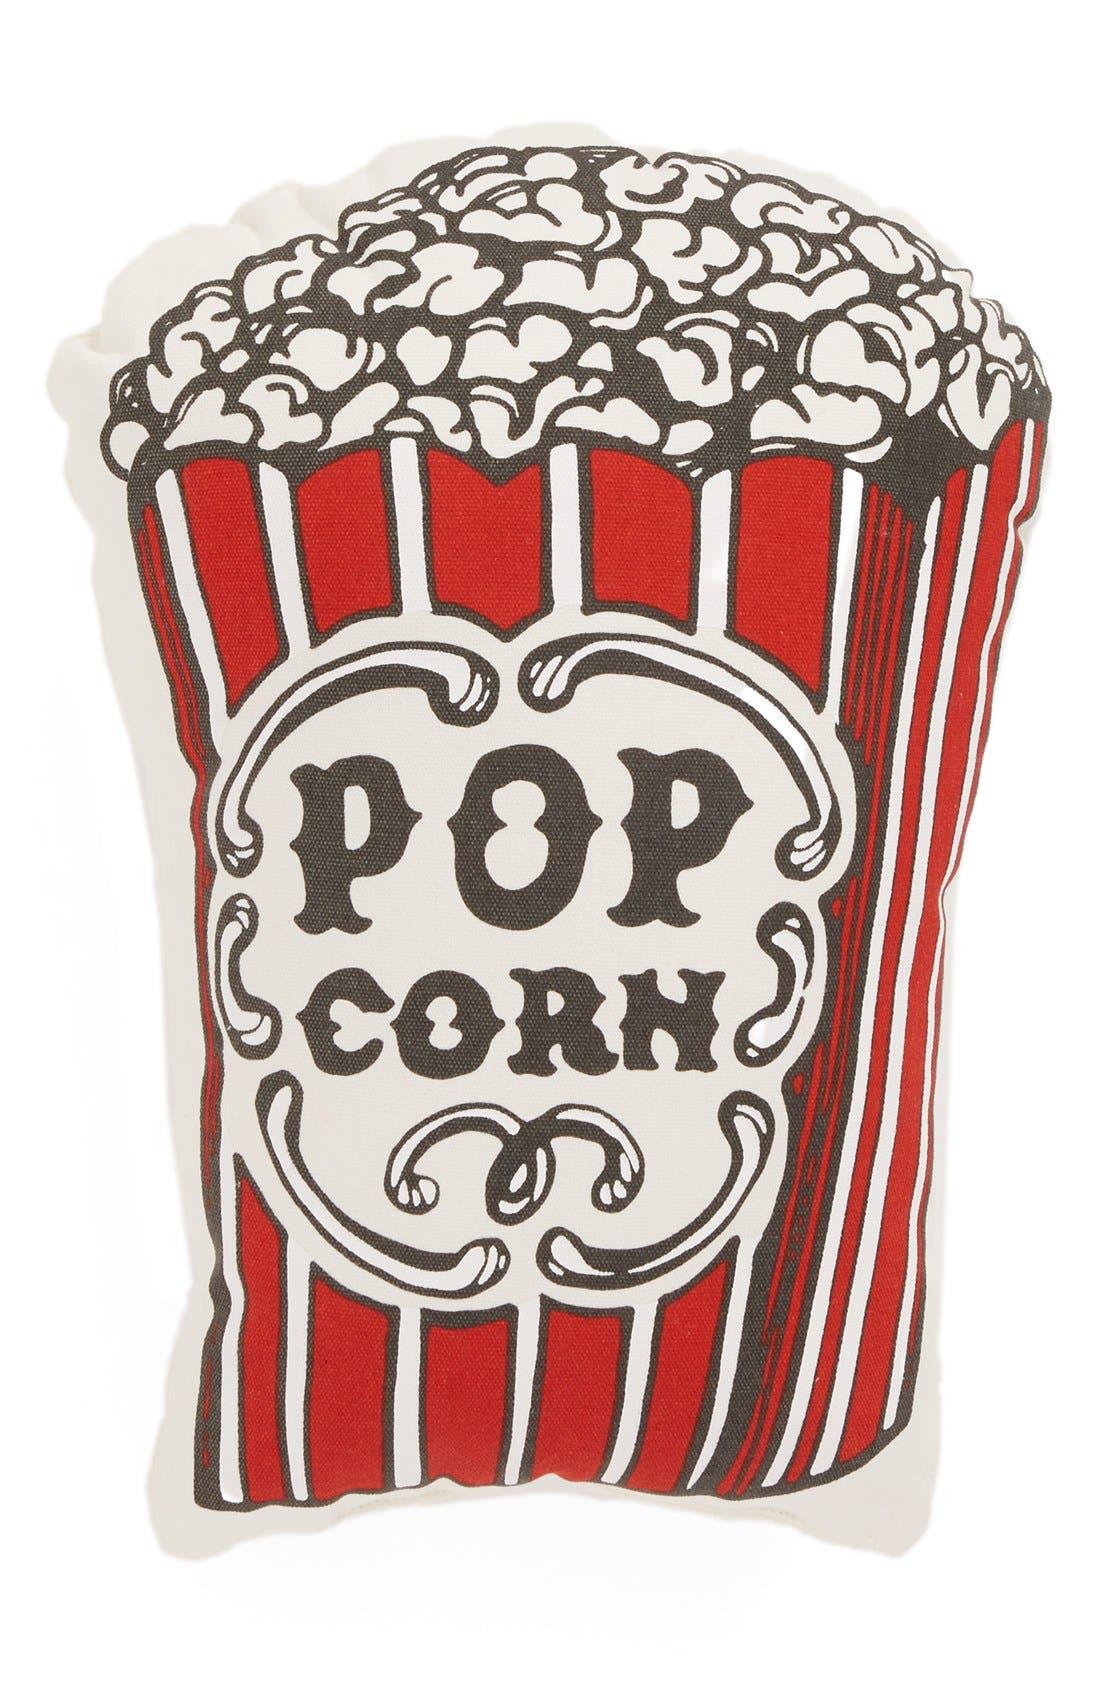 Main Image - Levtex 'Popcorn' Accent Pillow